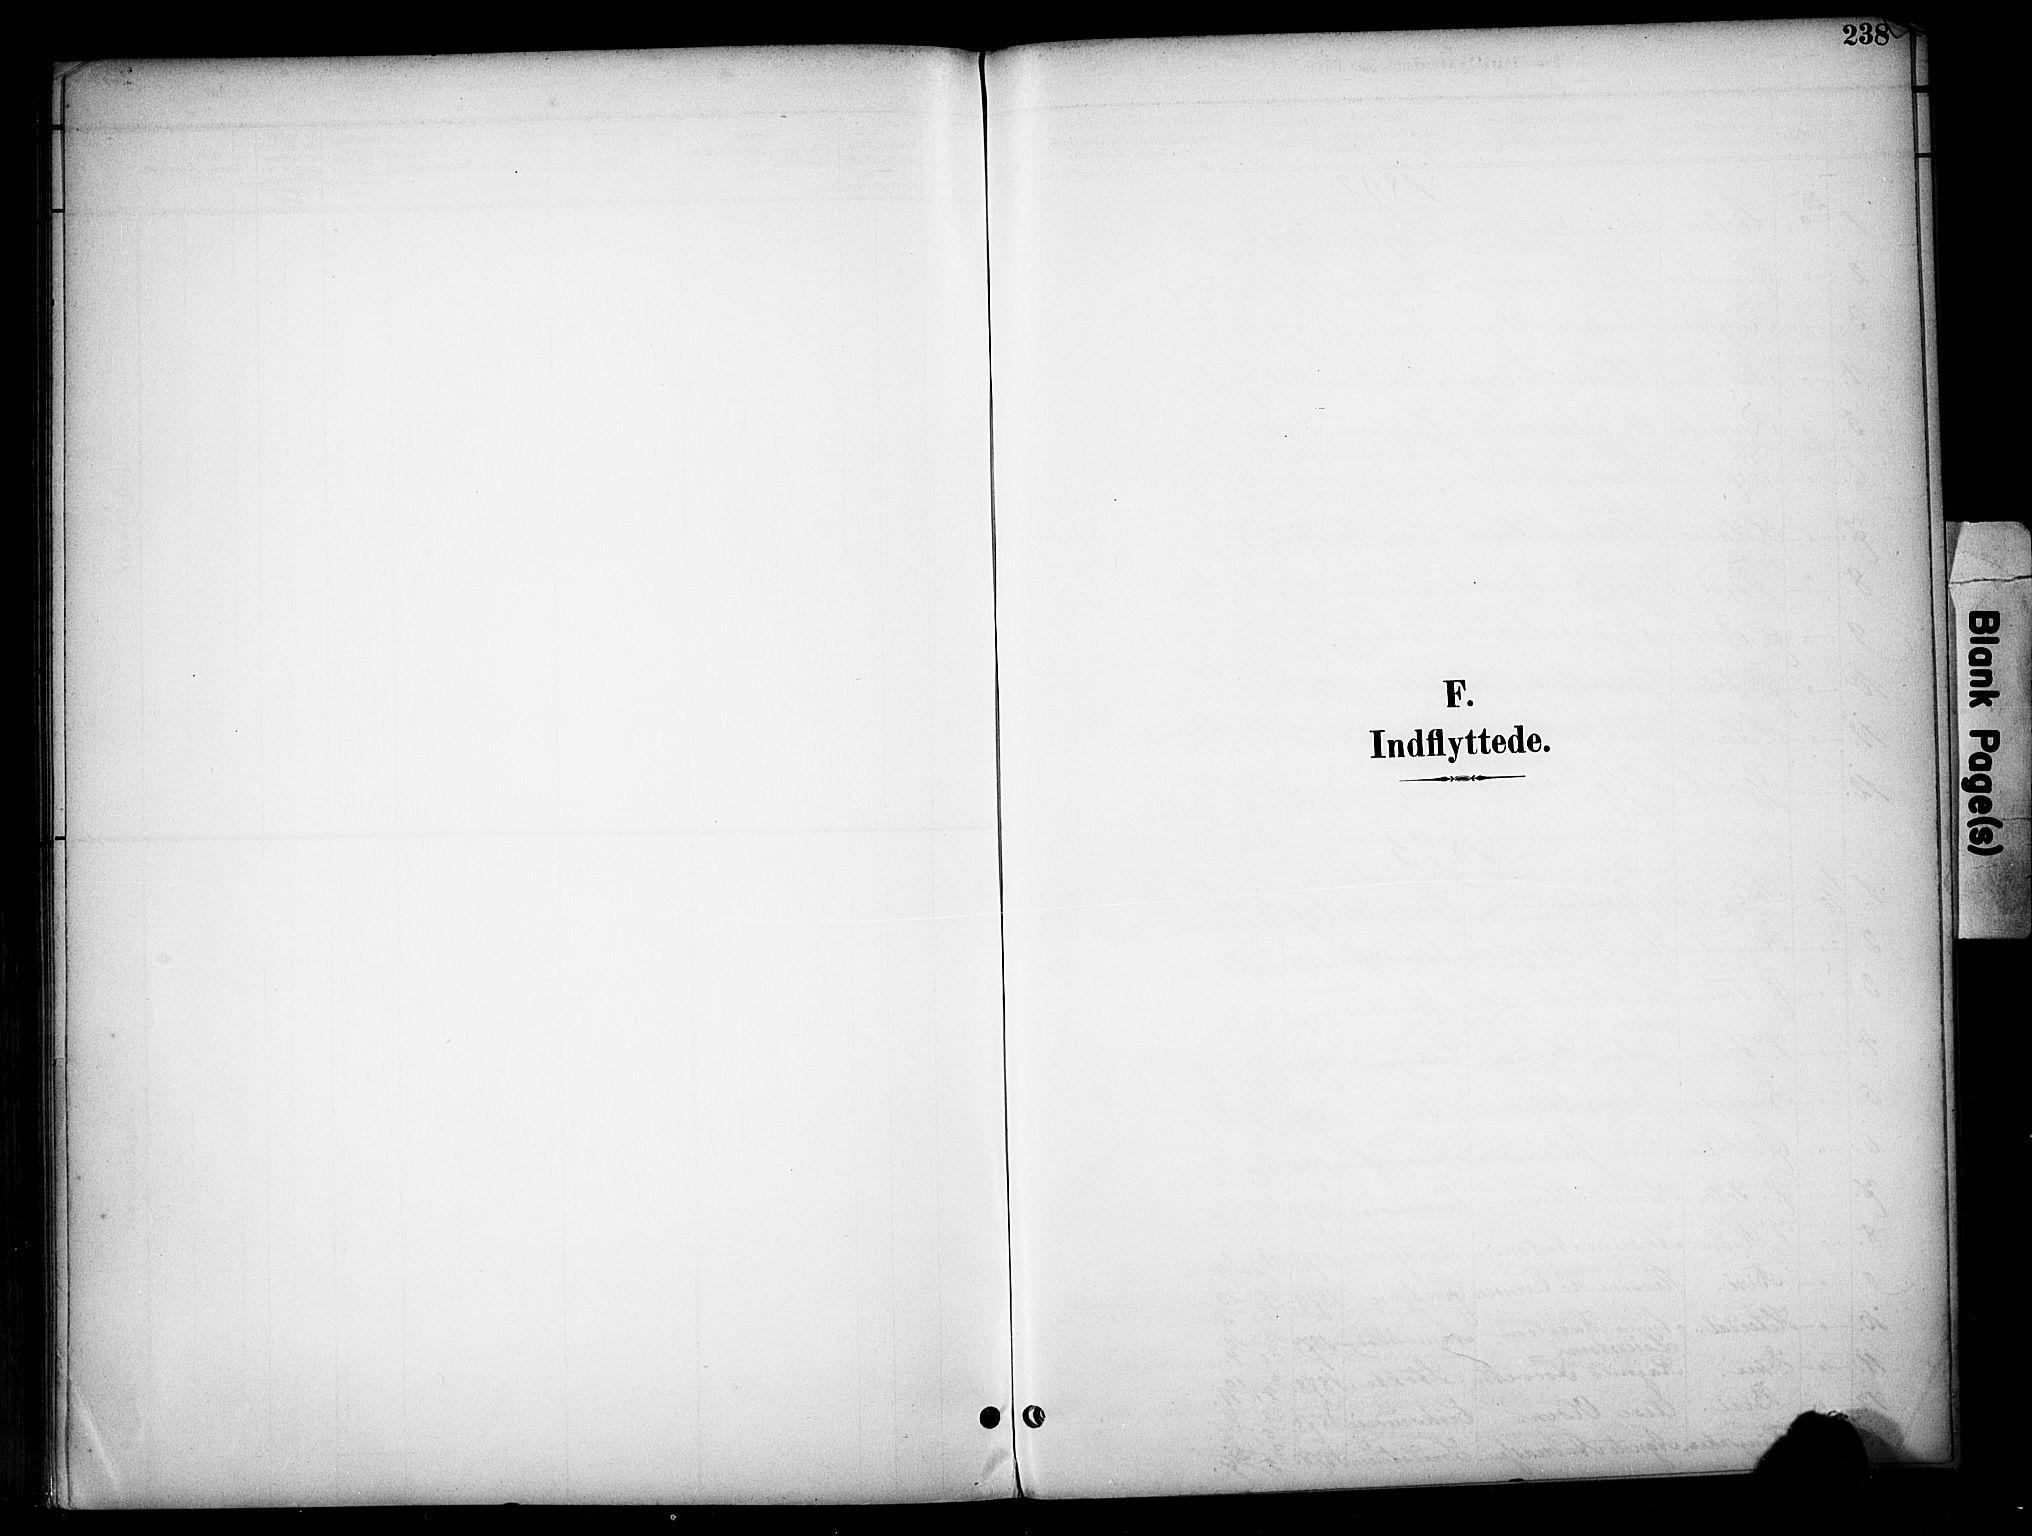 SAH, Vardal prestekontor, H/Ha/Haa/L0012: Ministerialbok nr. 12, 1893-1904, s. 238